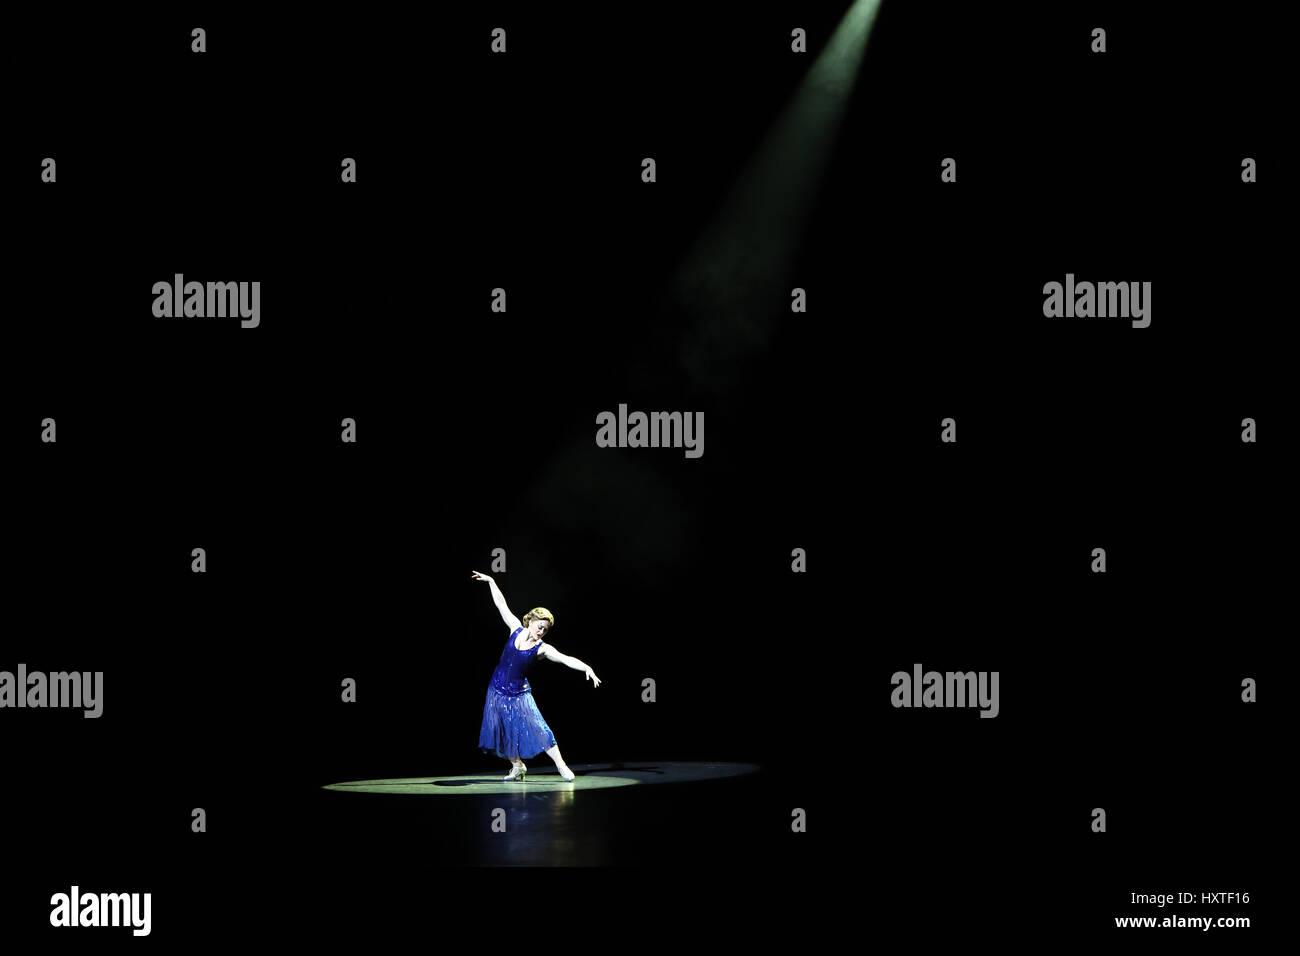 London, UK. 30th Mar, 2017. Pic shows: 42nd Street show at Theatre Royal Drury Lane starring Jasna Ivir as Maggie - Stock Image